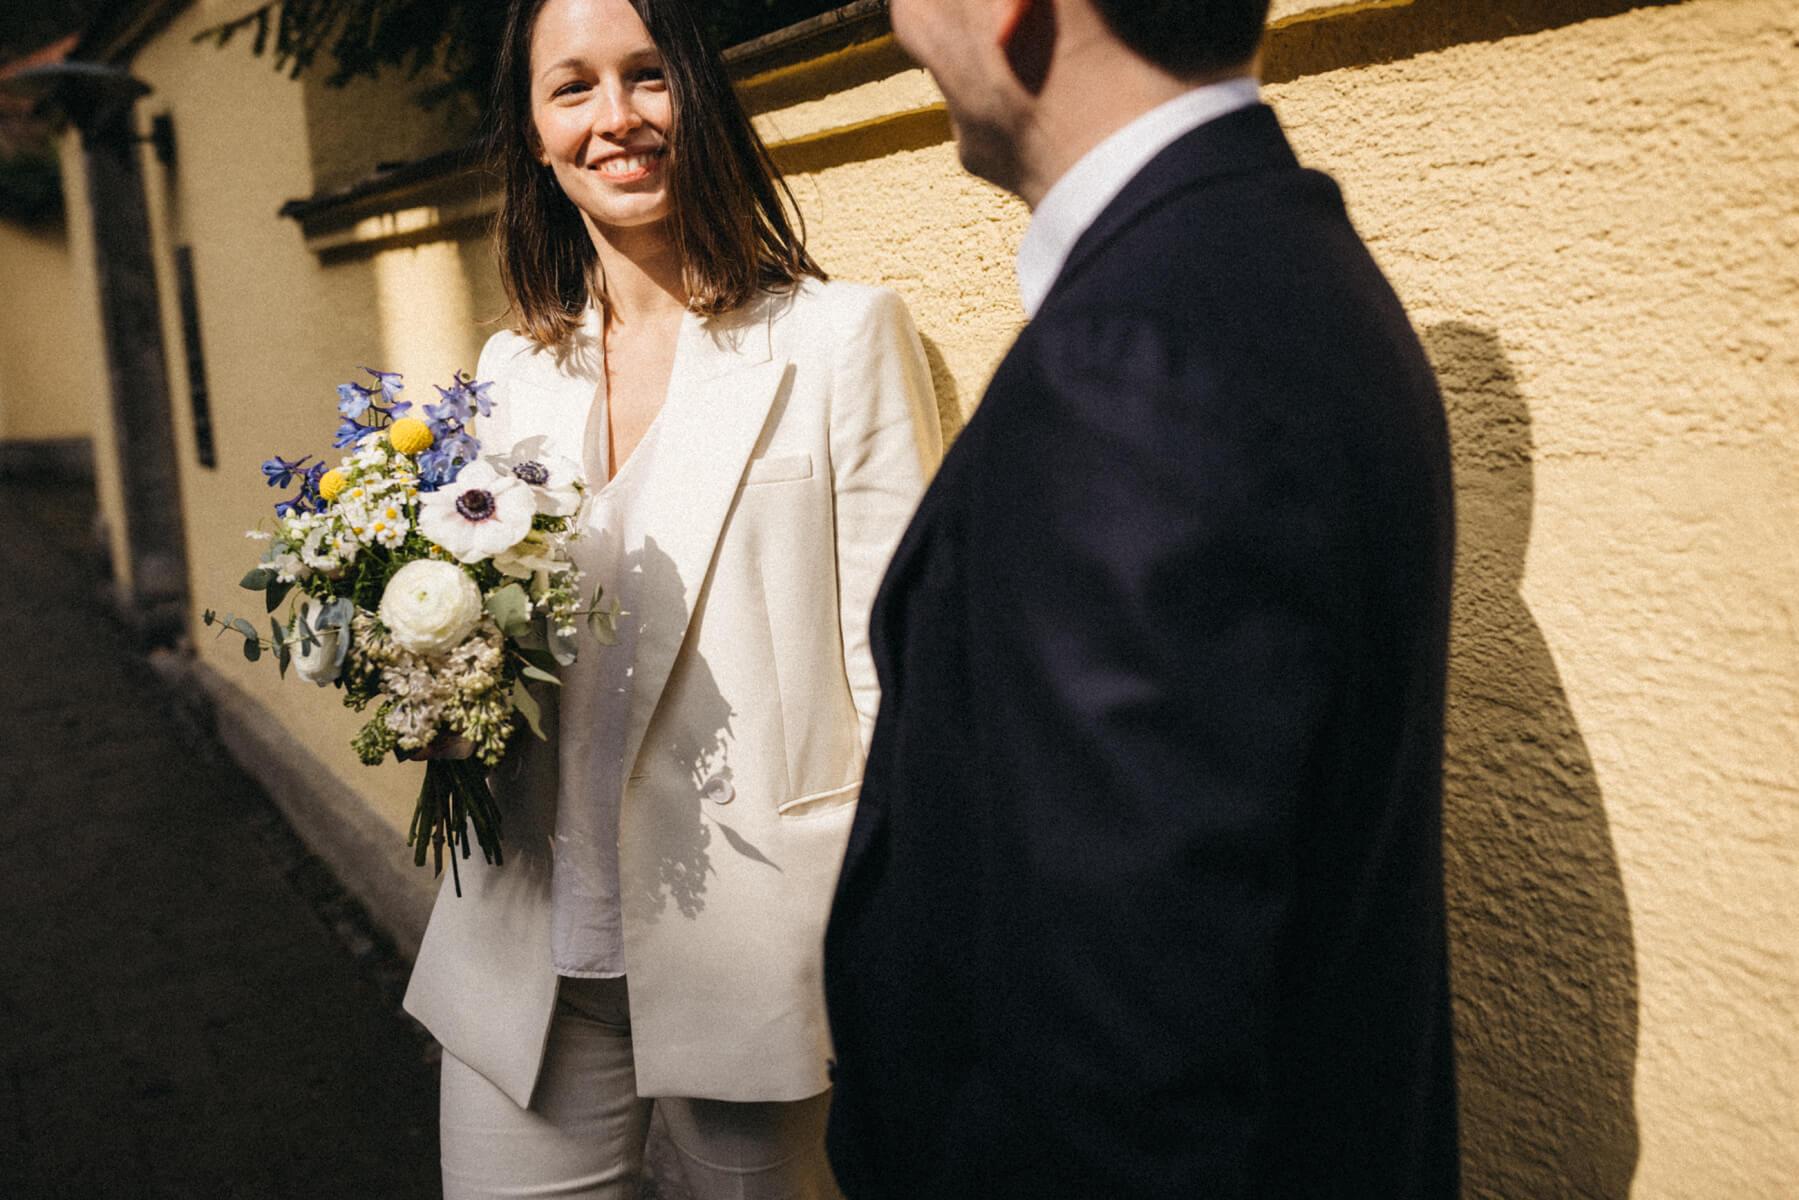 raissa simon fotografie urban civil wedding munich 012 - Nikolija + Niko